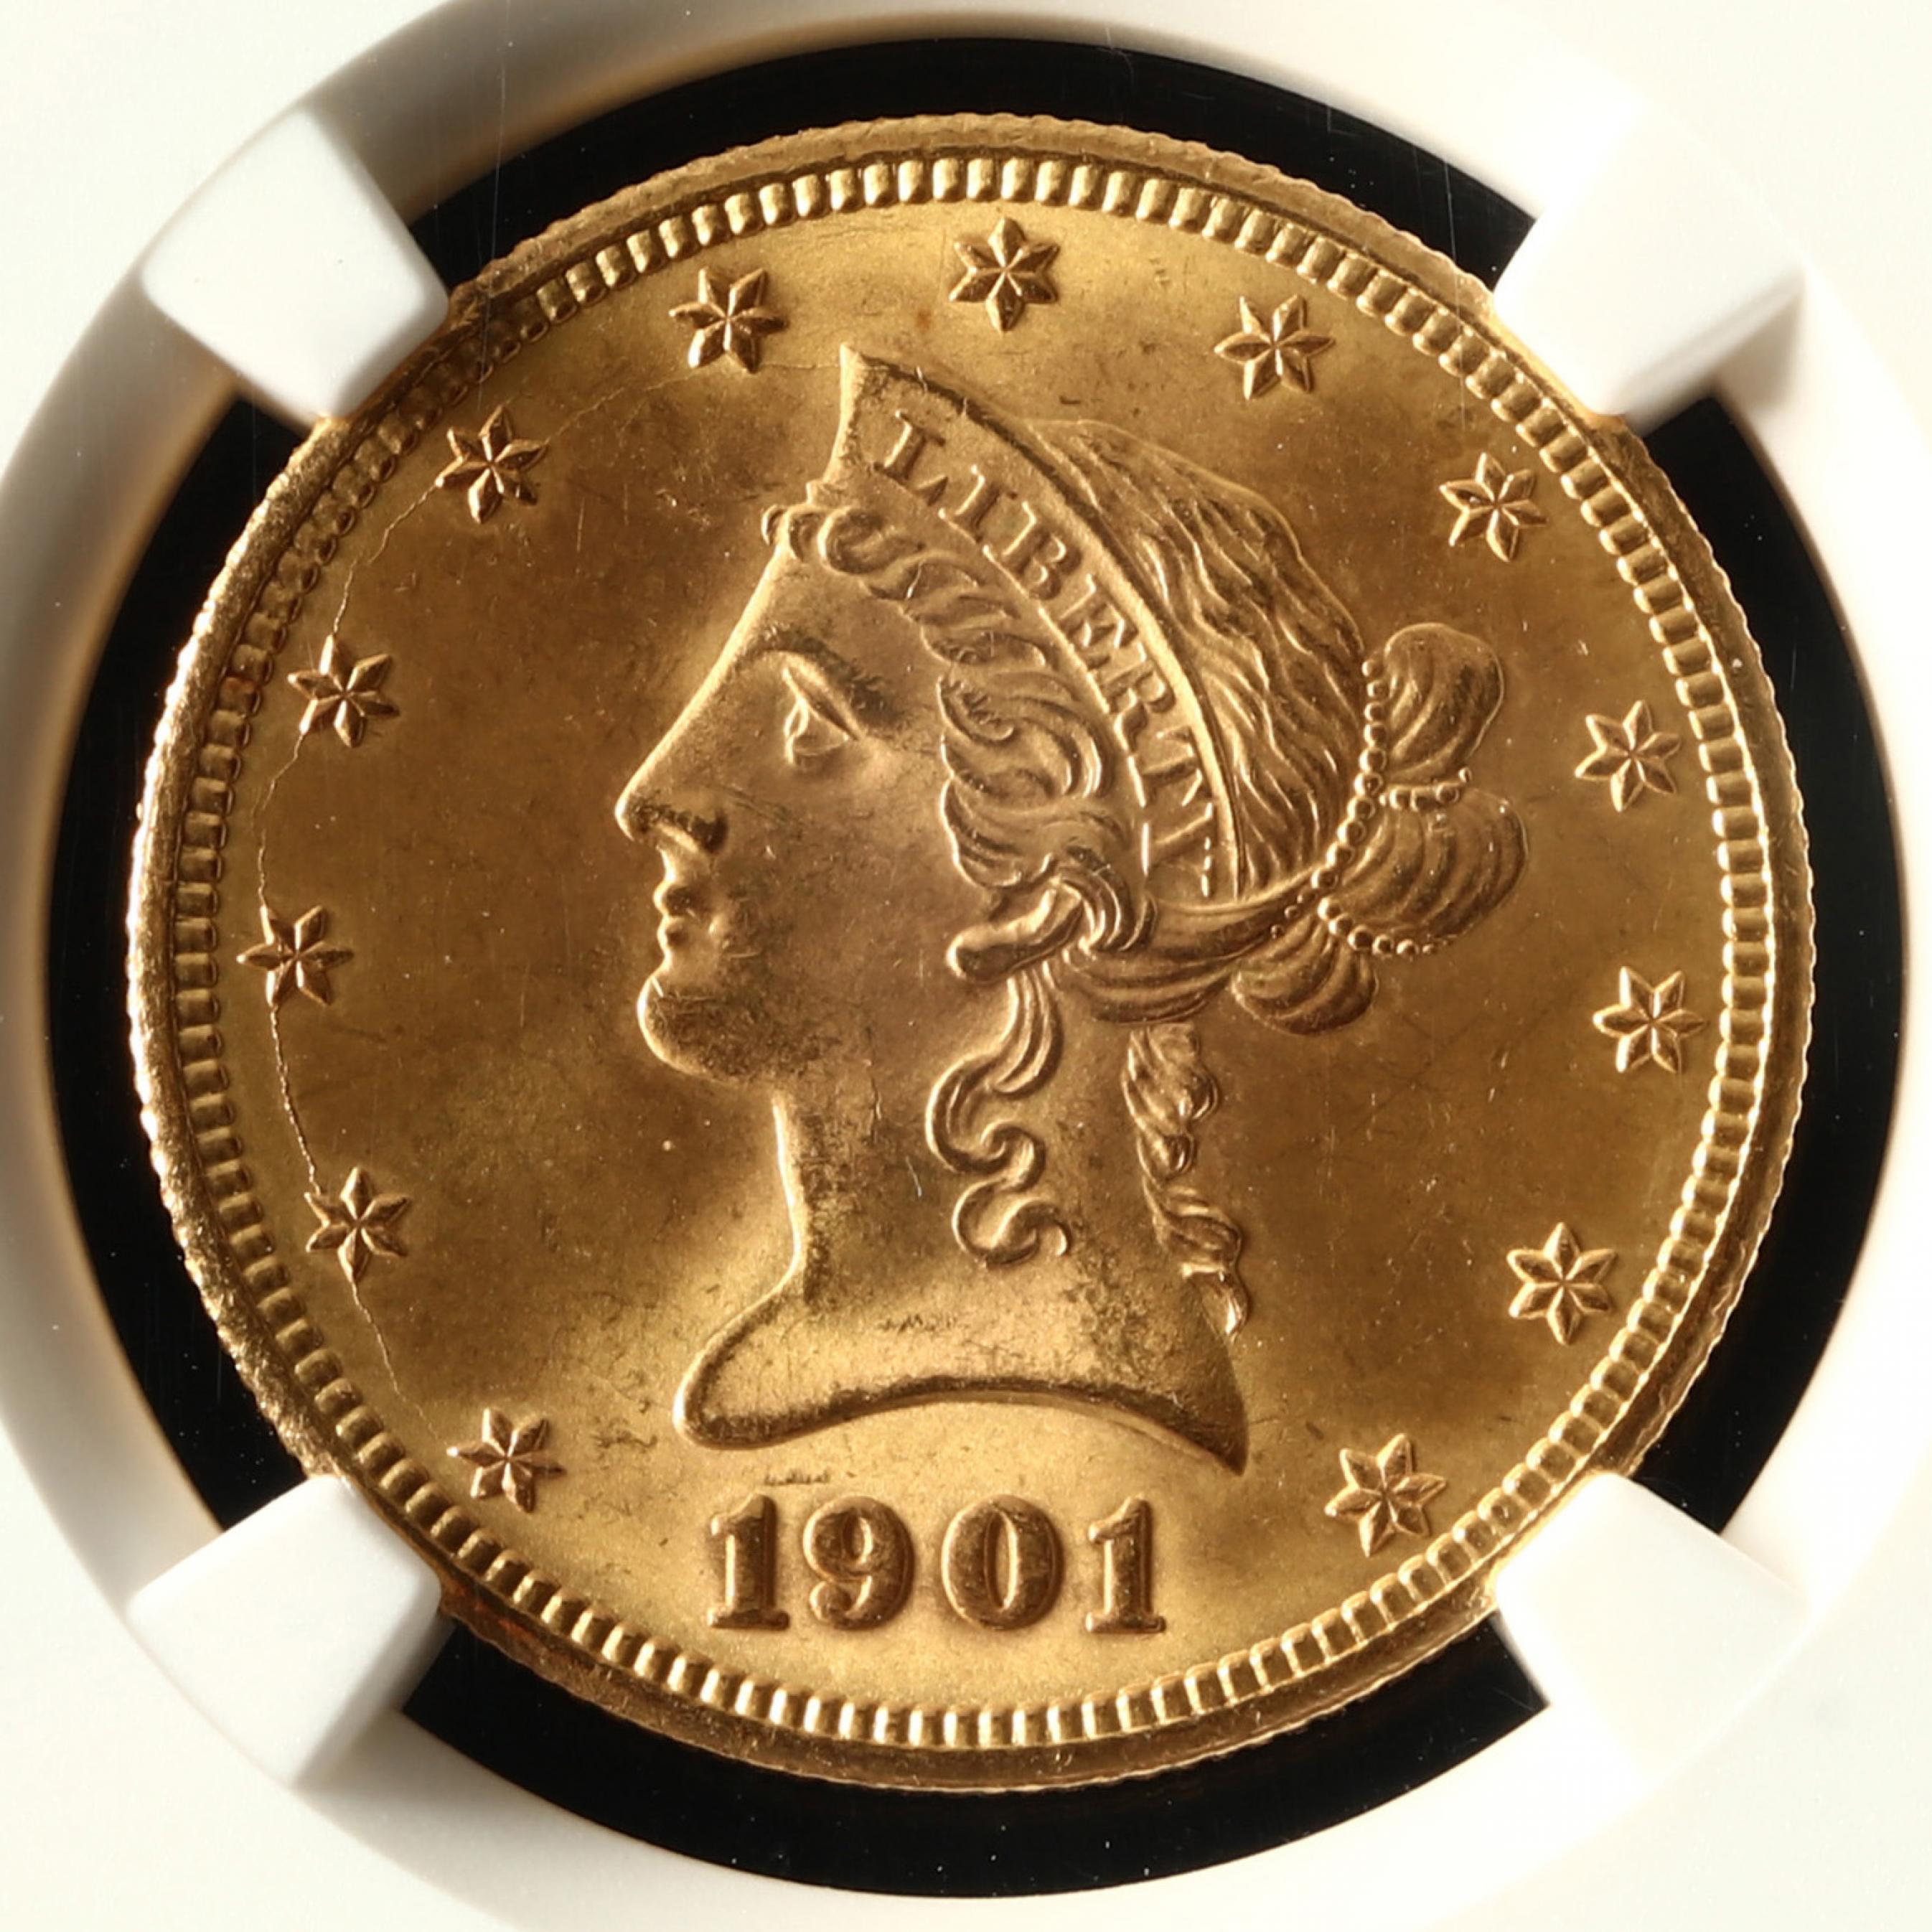 1901-s-10-liberty-head-gold-eagle-ngc-ms65